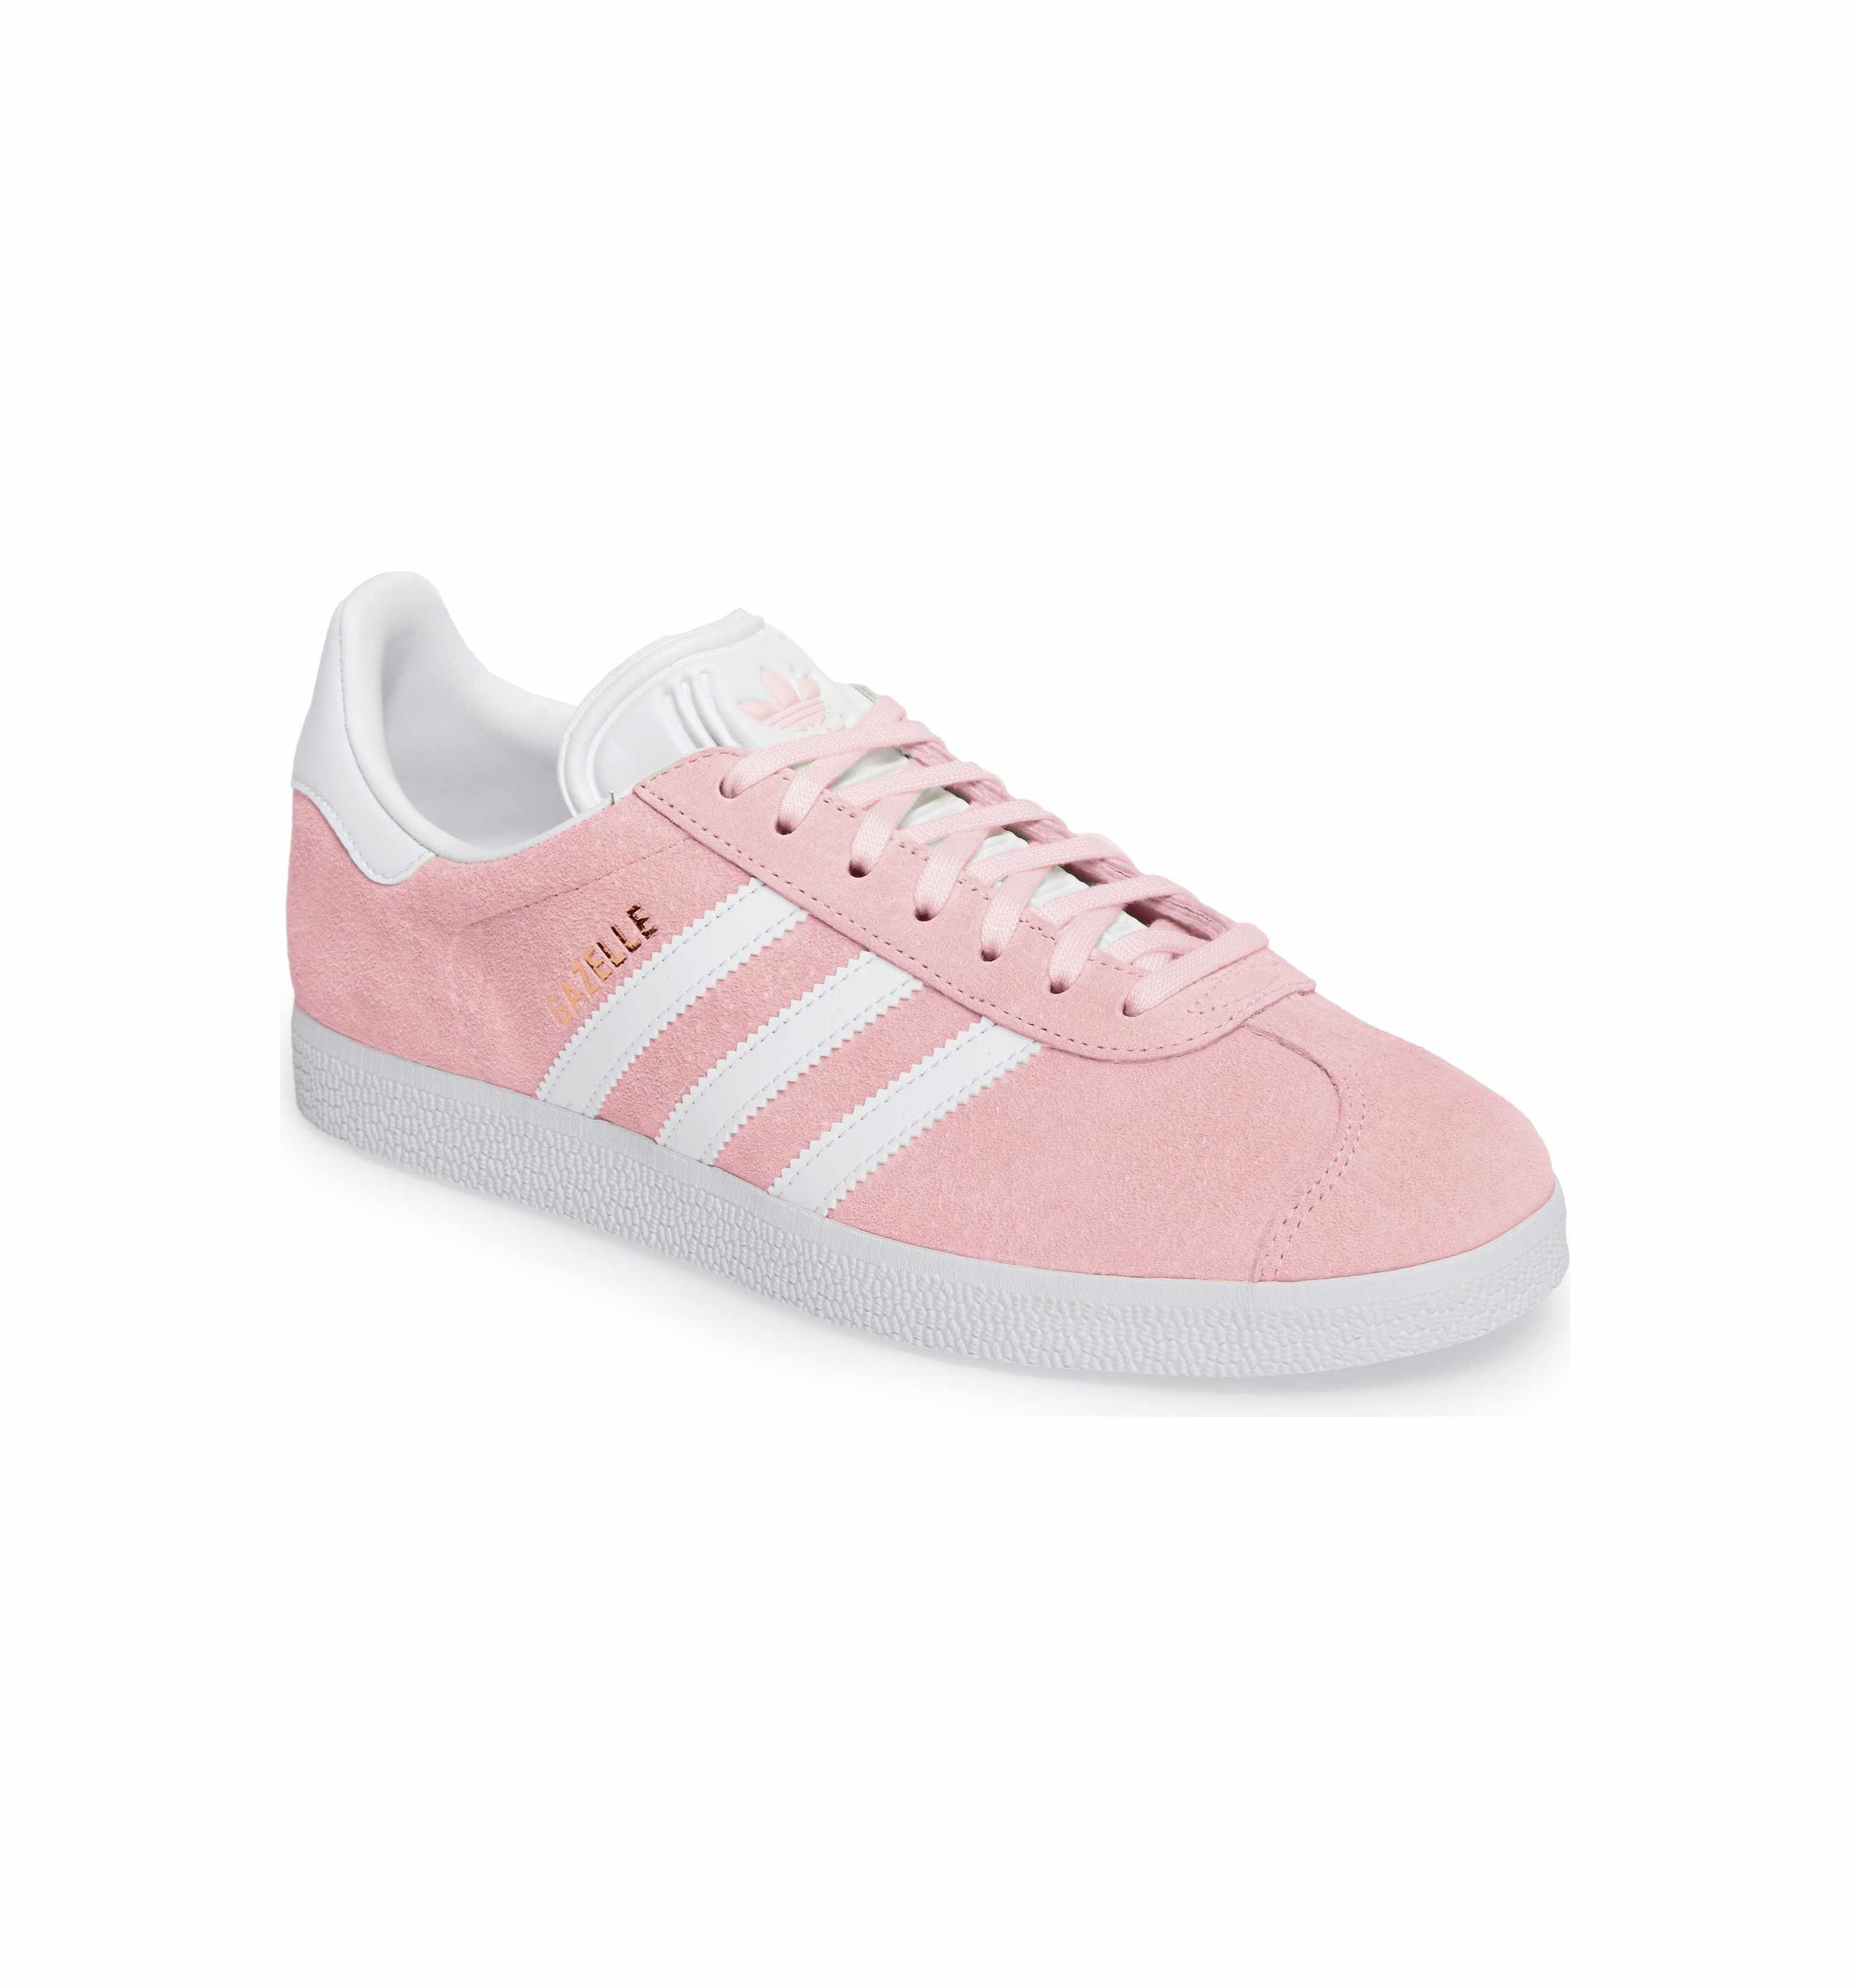 Main Image - adidas Gazelle Sneaker | Adidas originals fashion ...